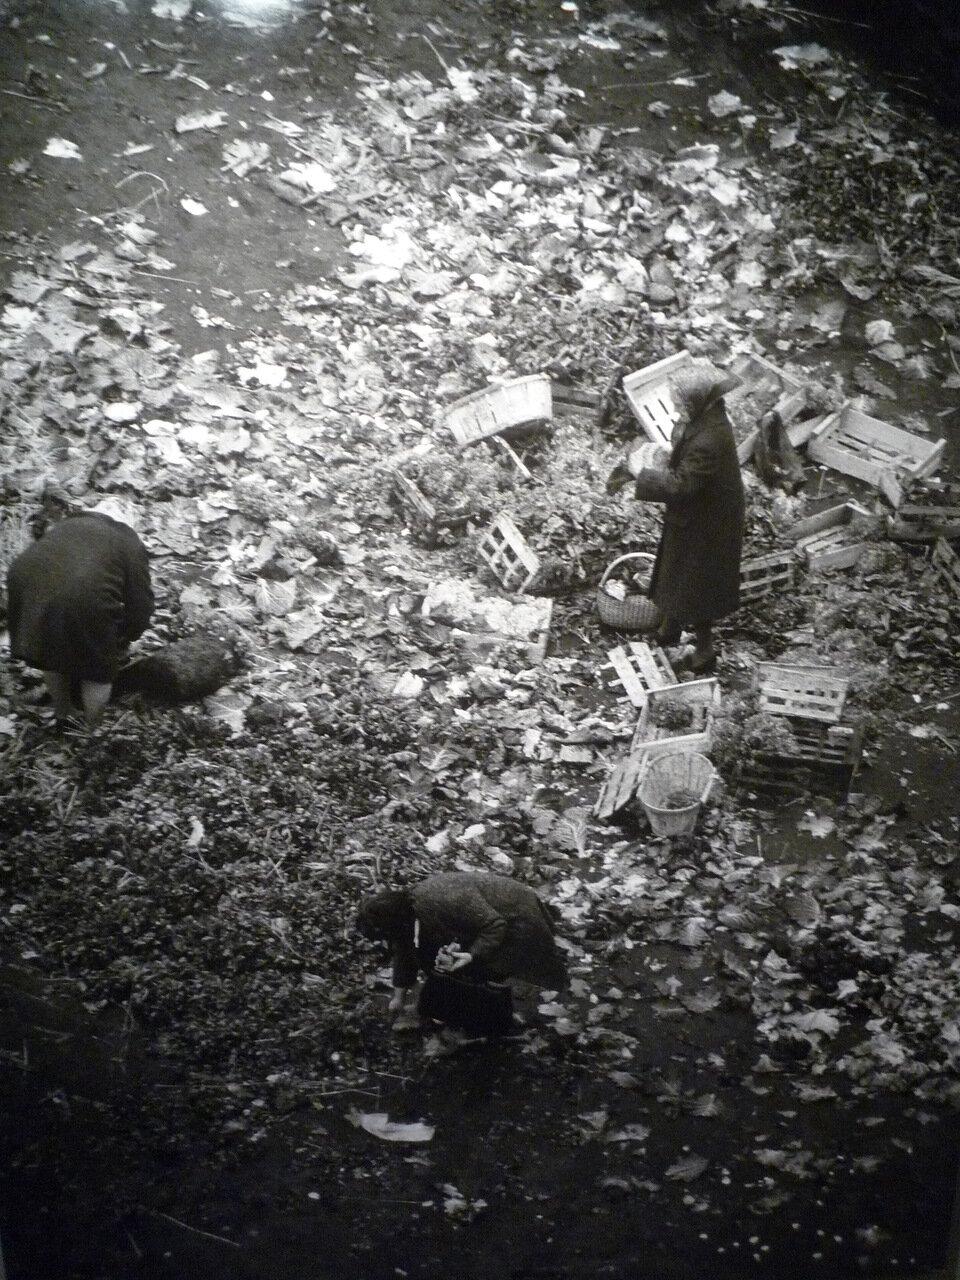 1967. Ле-Аль. После закрытия рынка